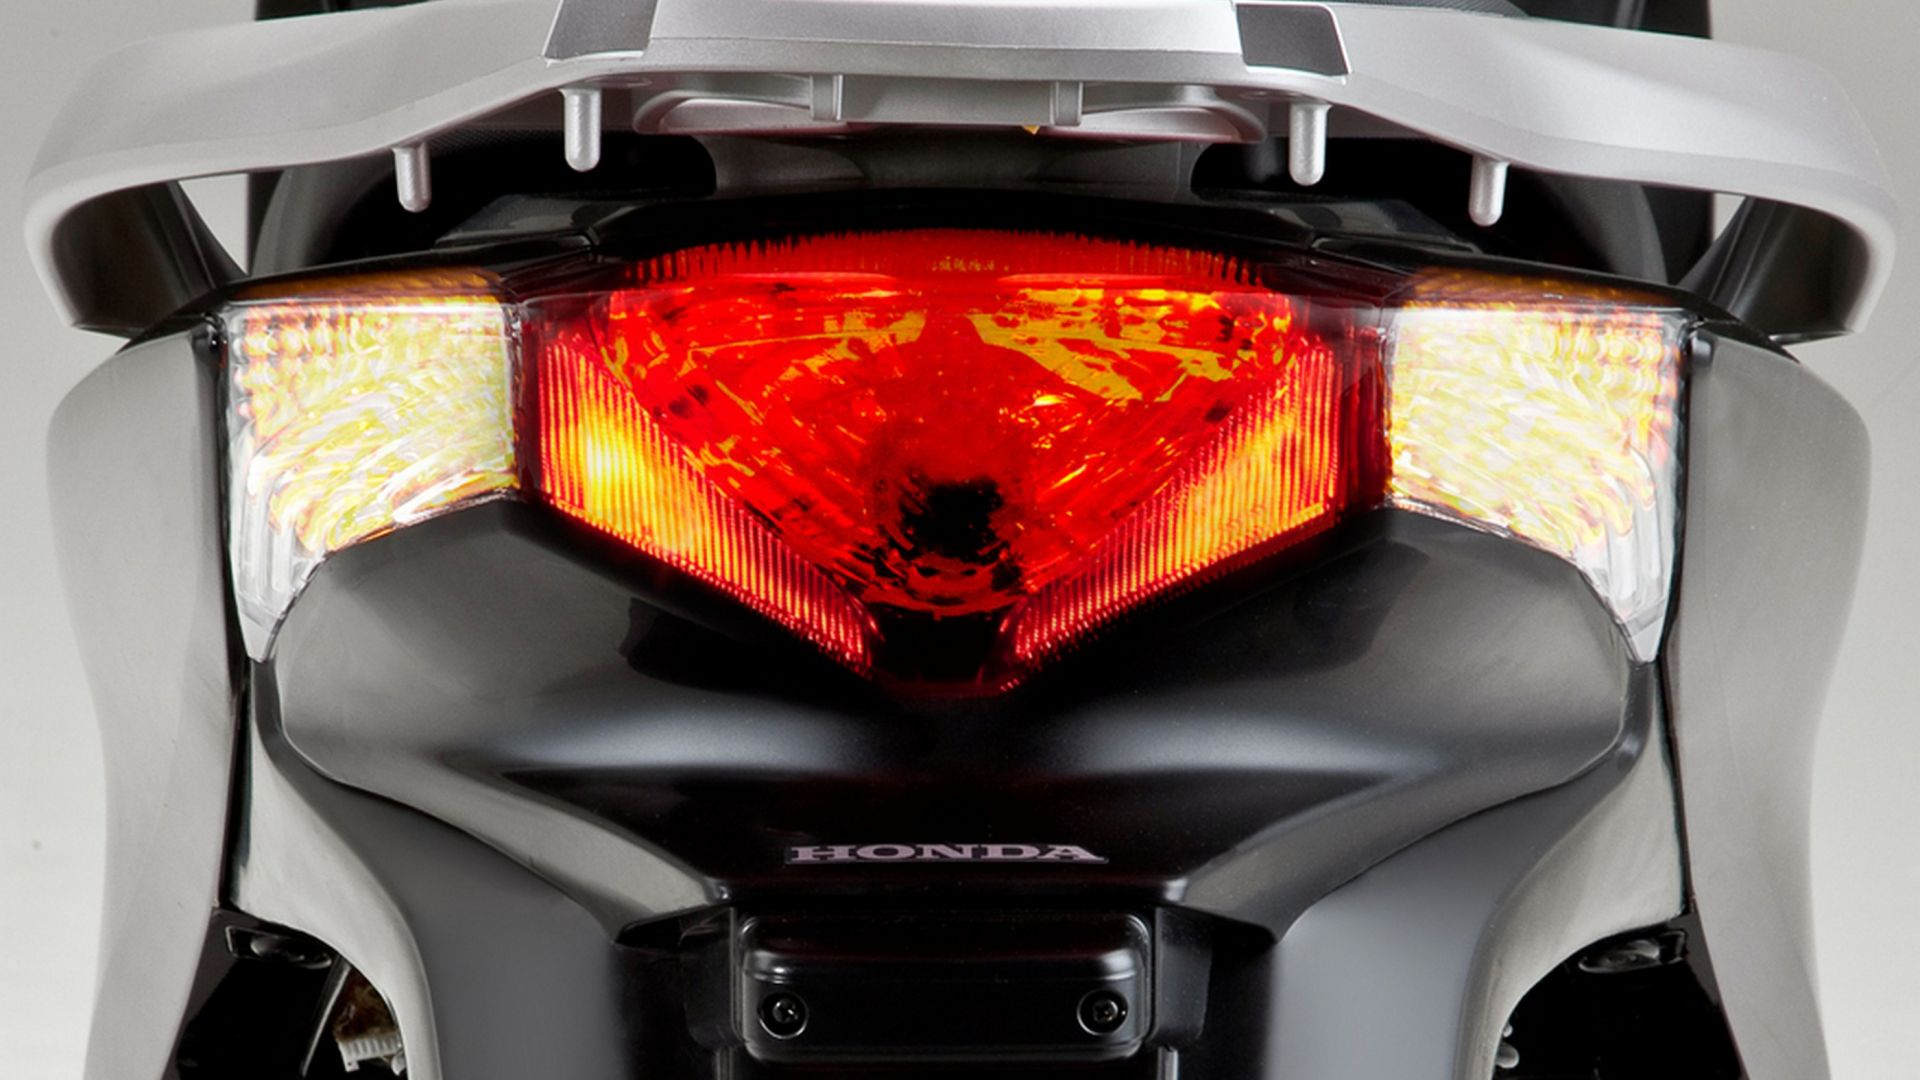 Immagine 82: Honda SH 125/150i ABS 2013